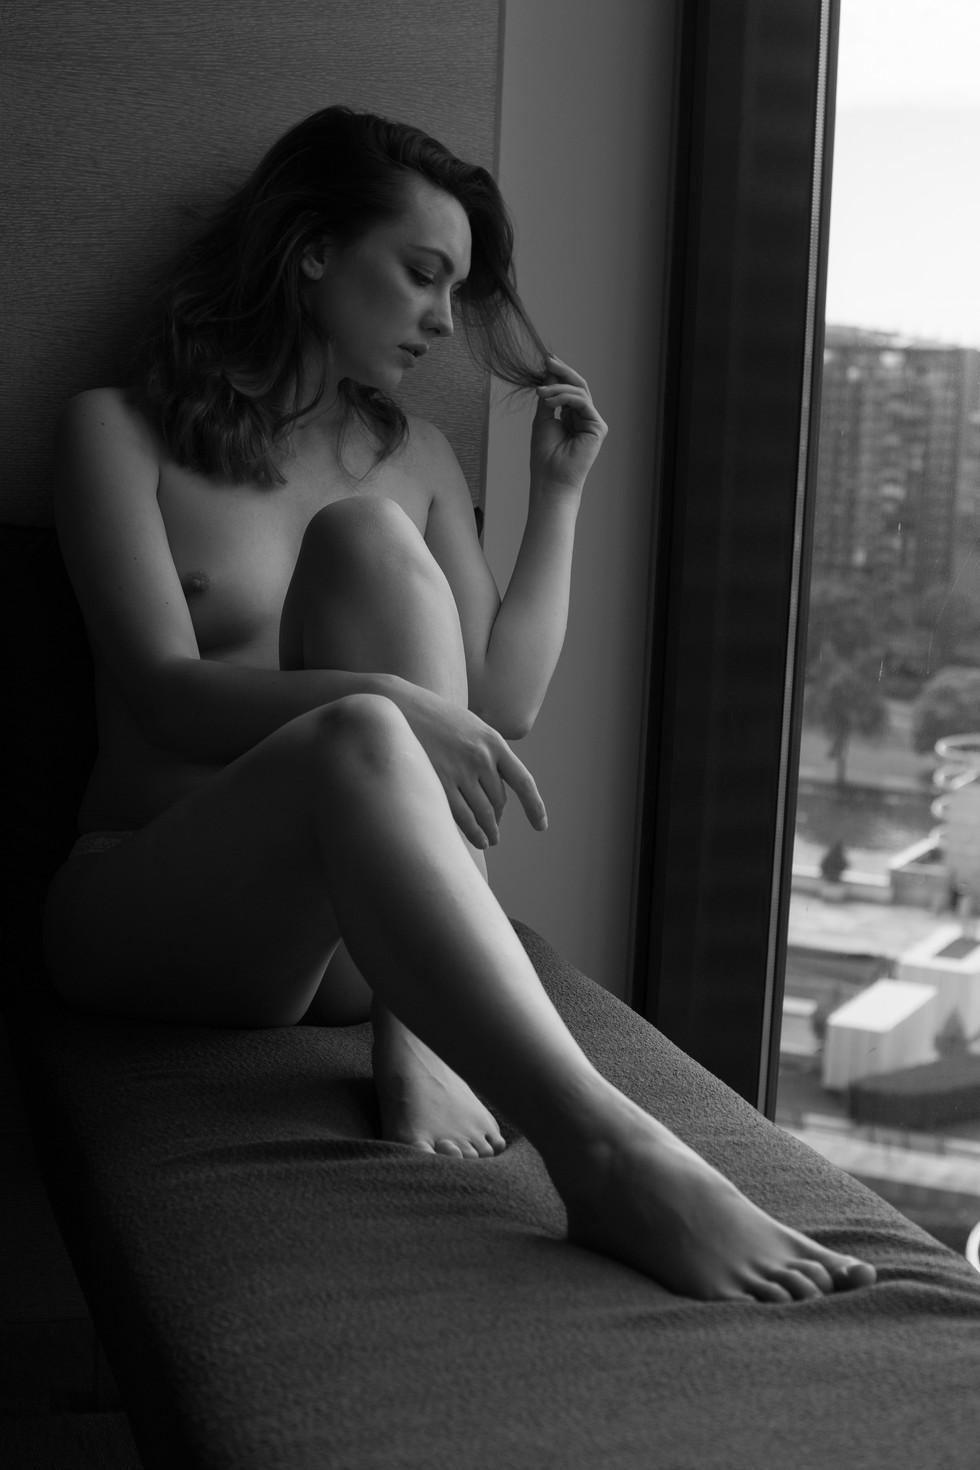 Kyla_by_CoogeePhotography-86721.jpg